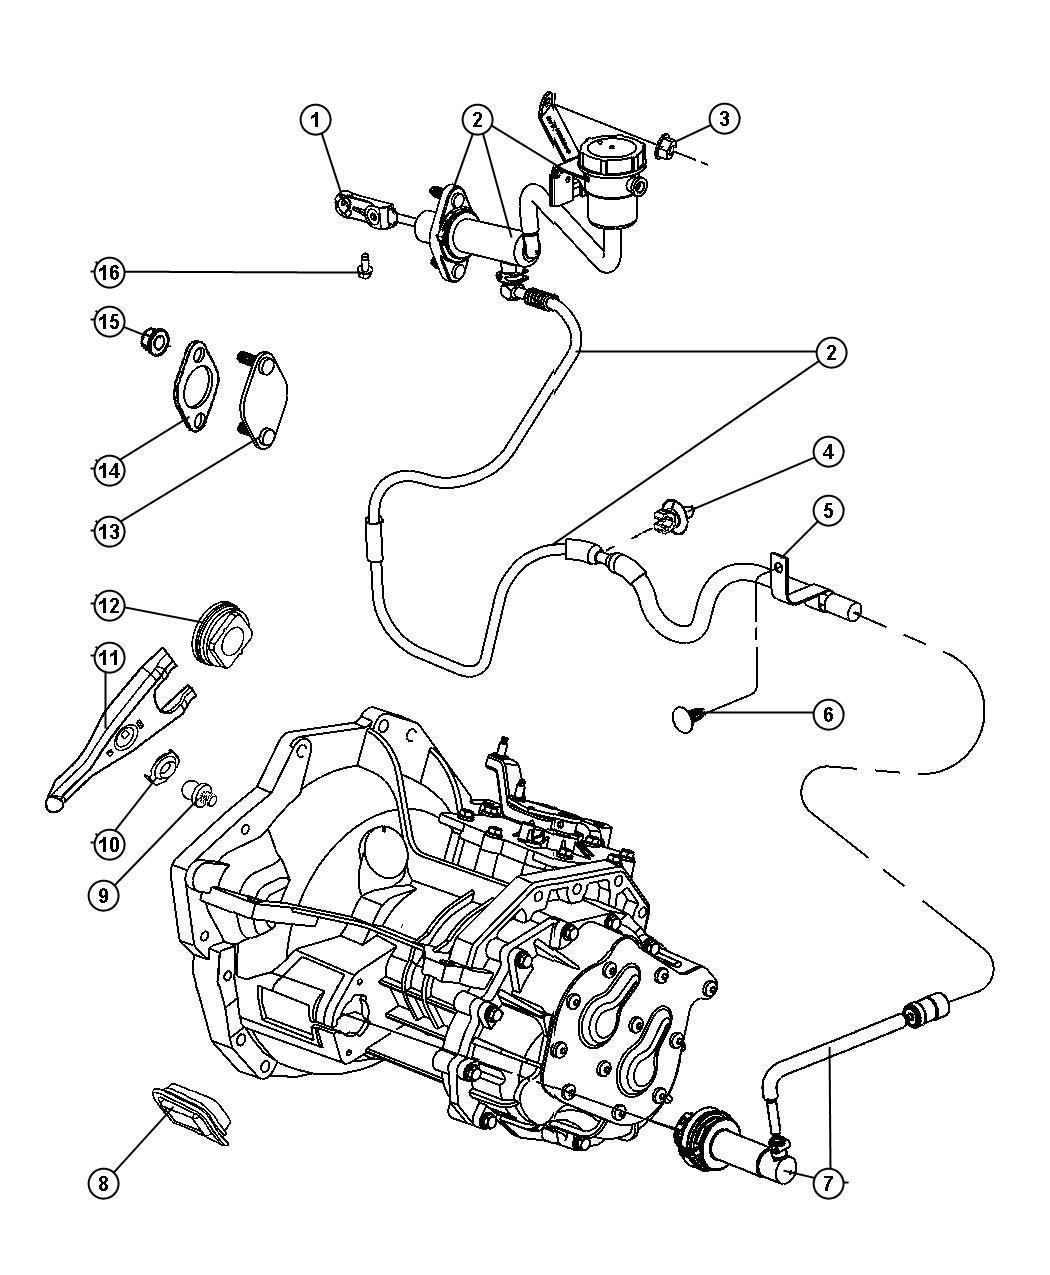 Dodge Neon Manual